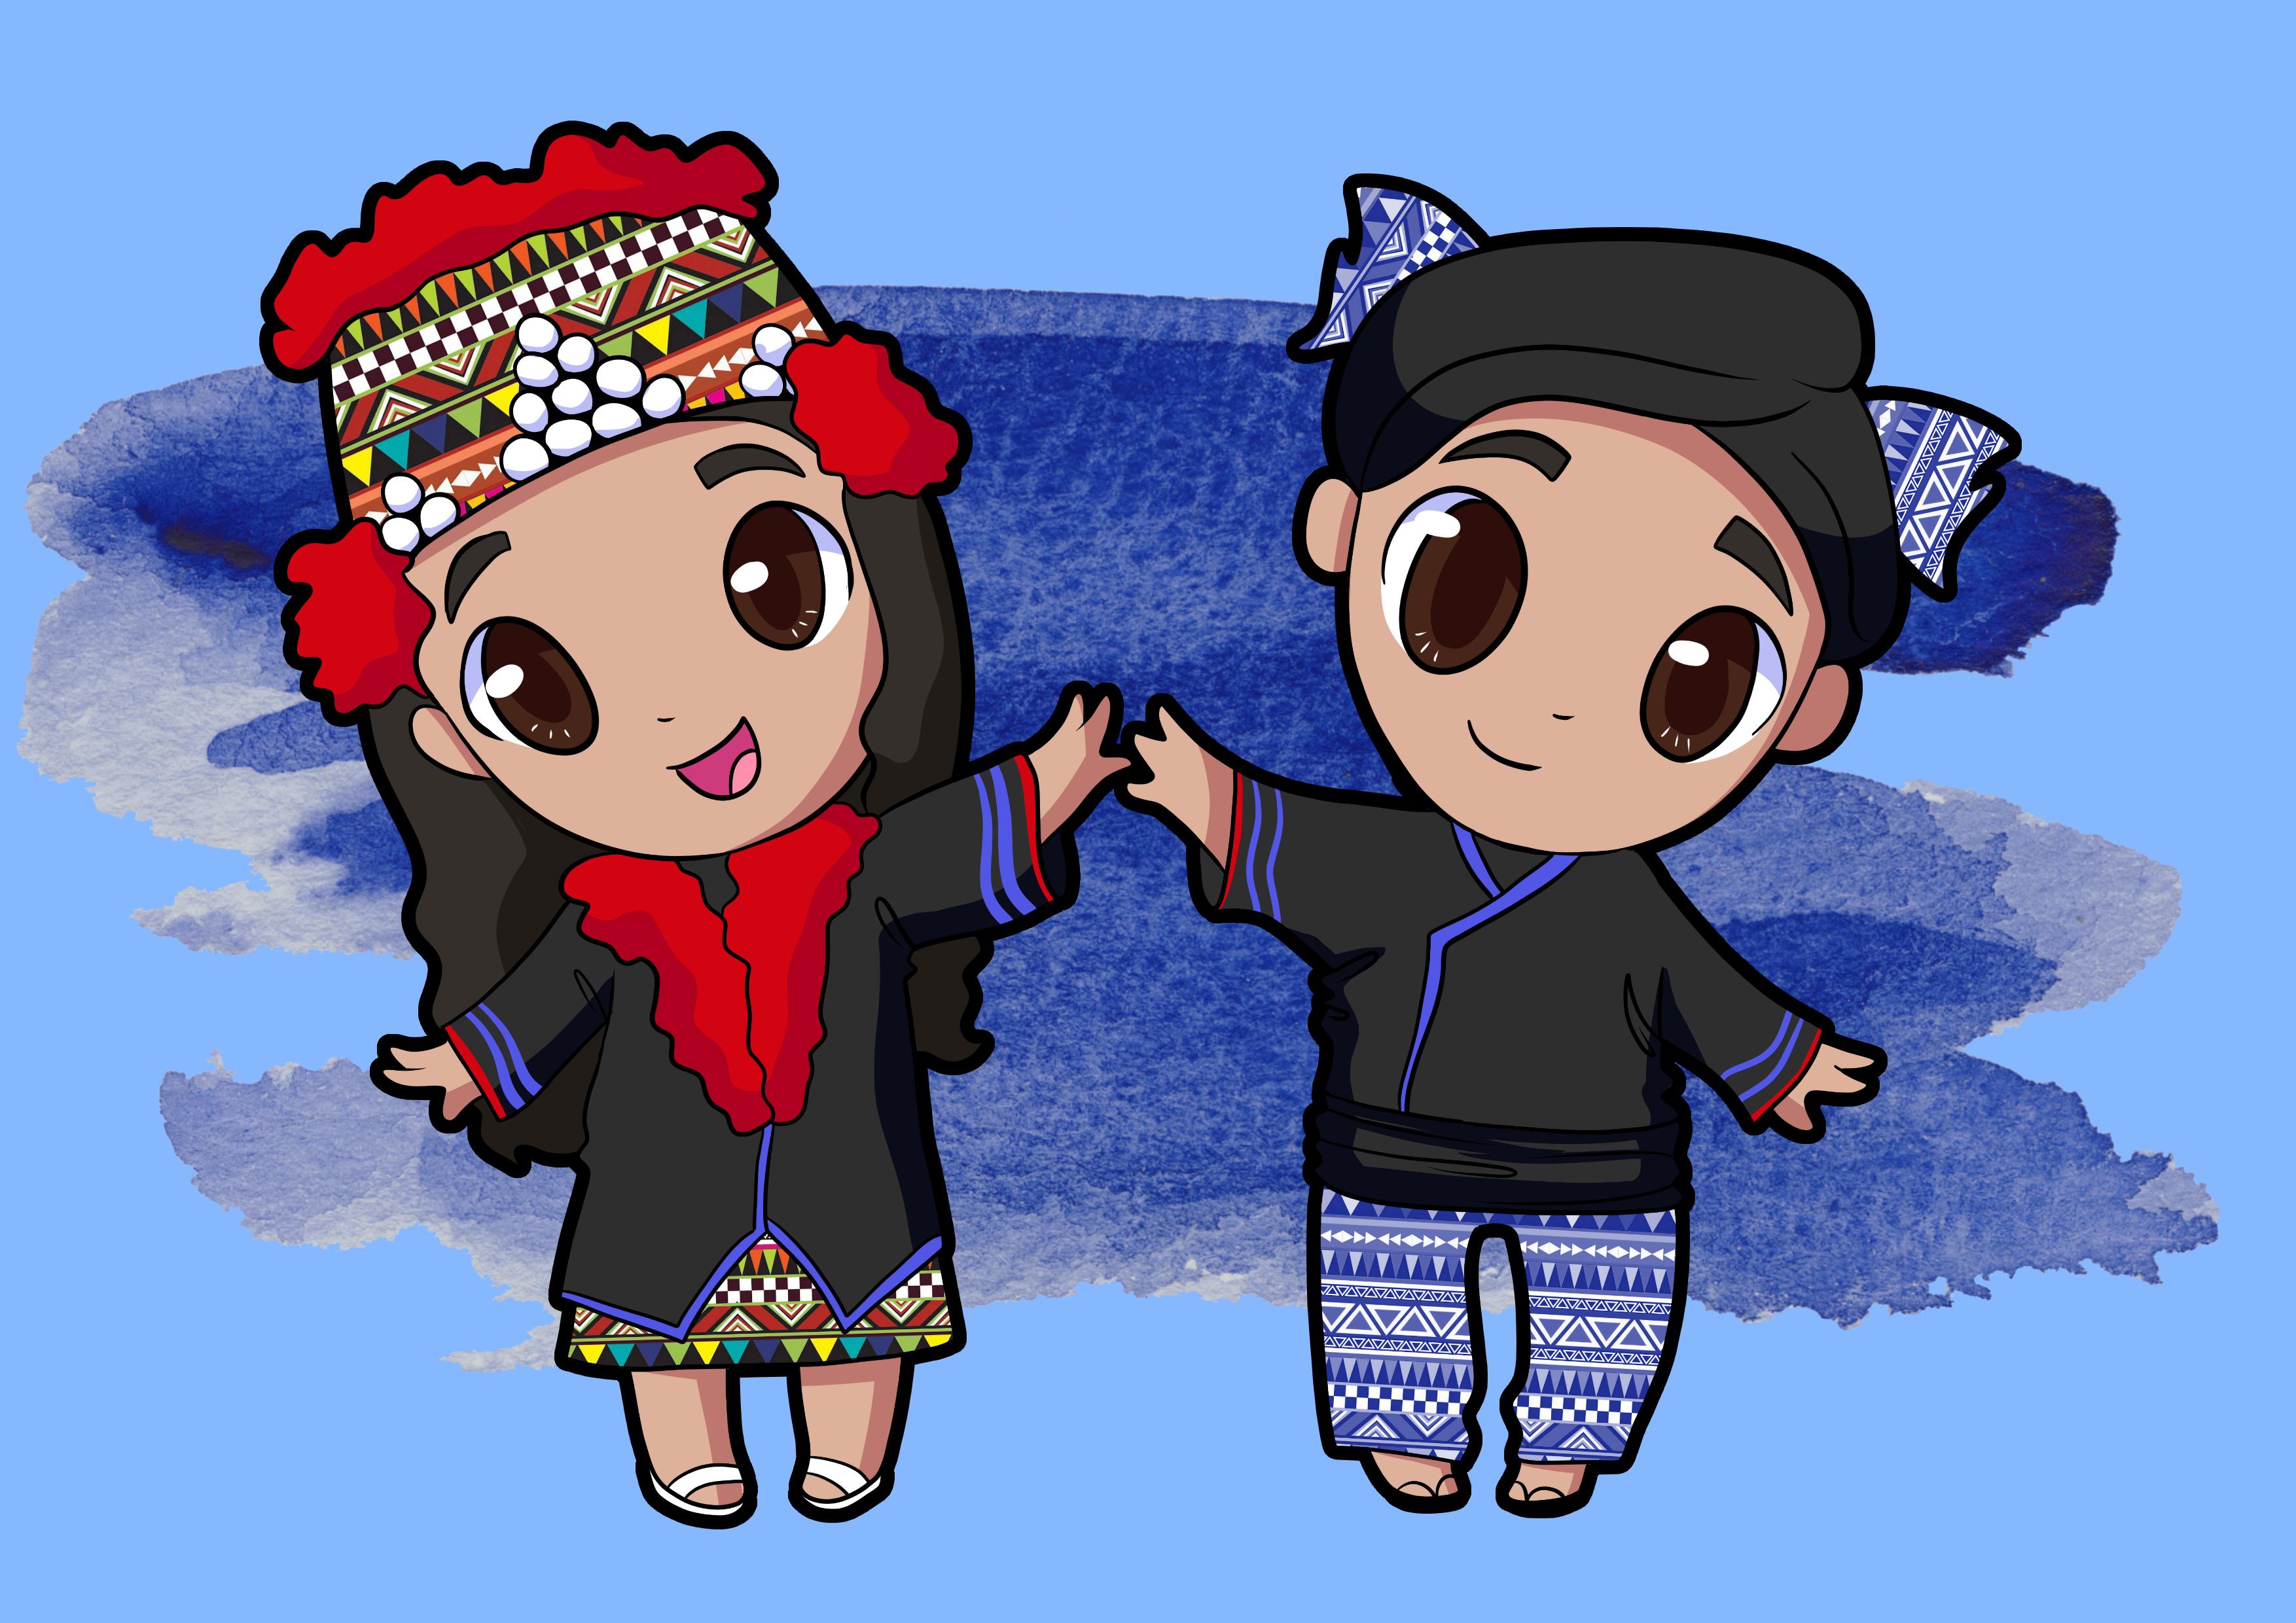 Adorable Cute Cartoon Chibi Design